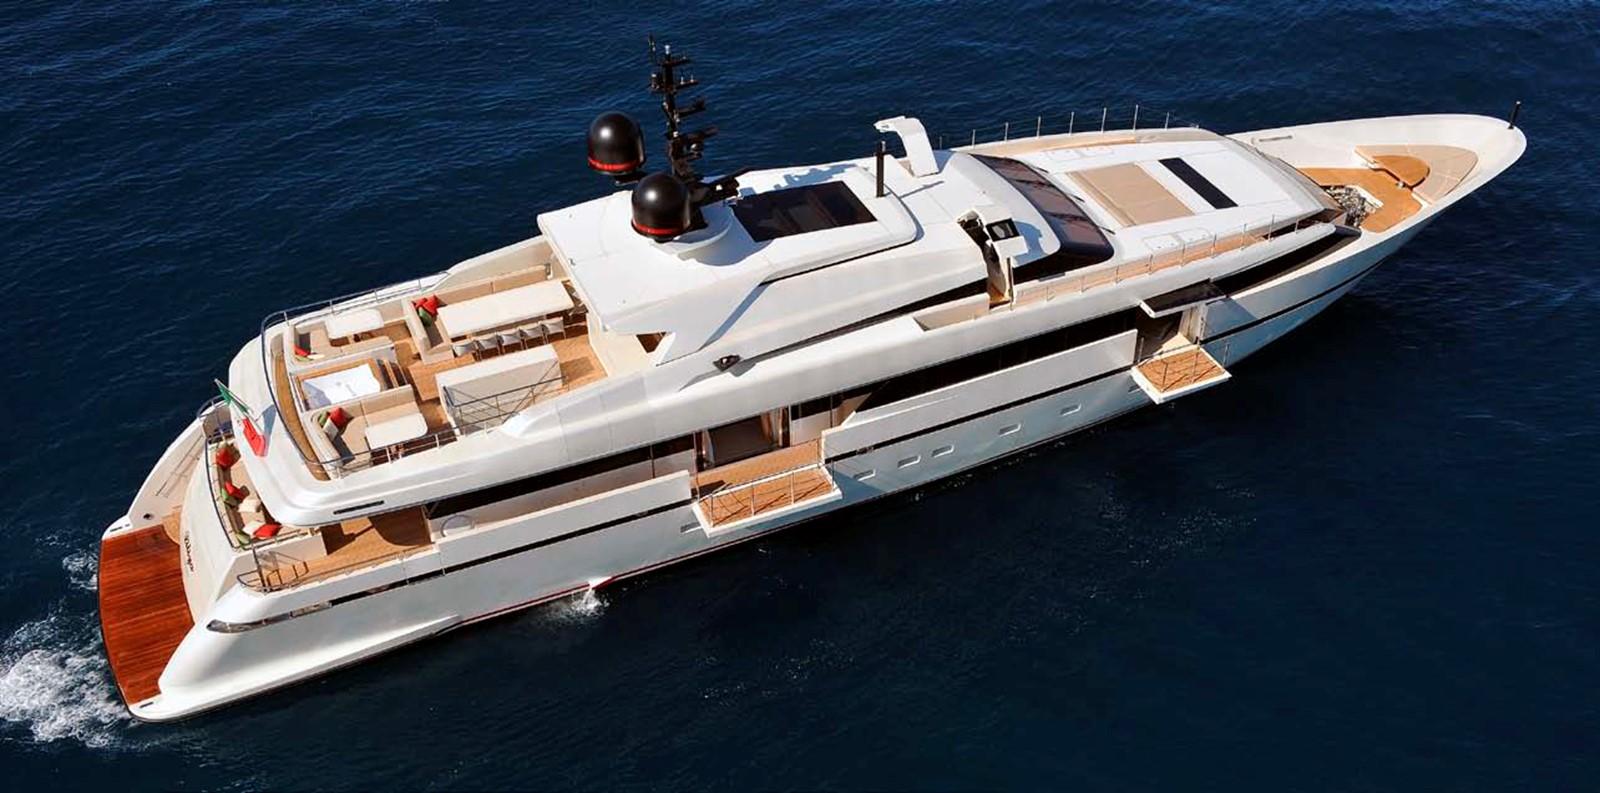 2013 SANLORENZO 40ALLOY Motor Yacht 1356922